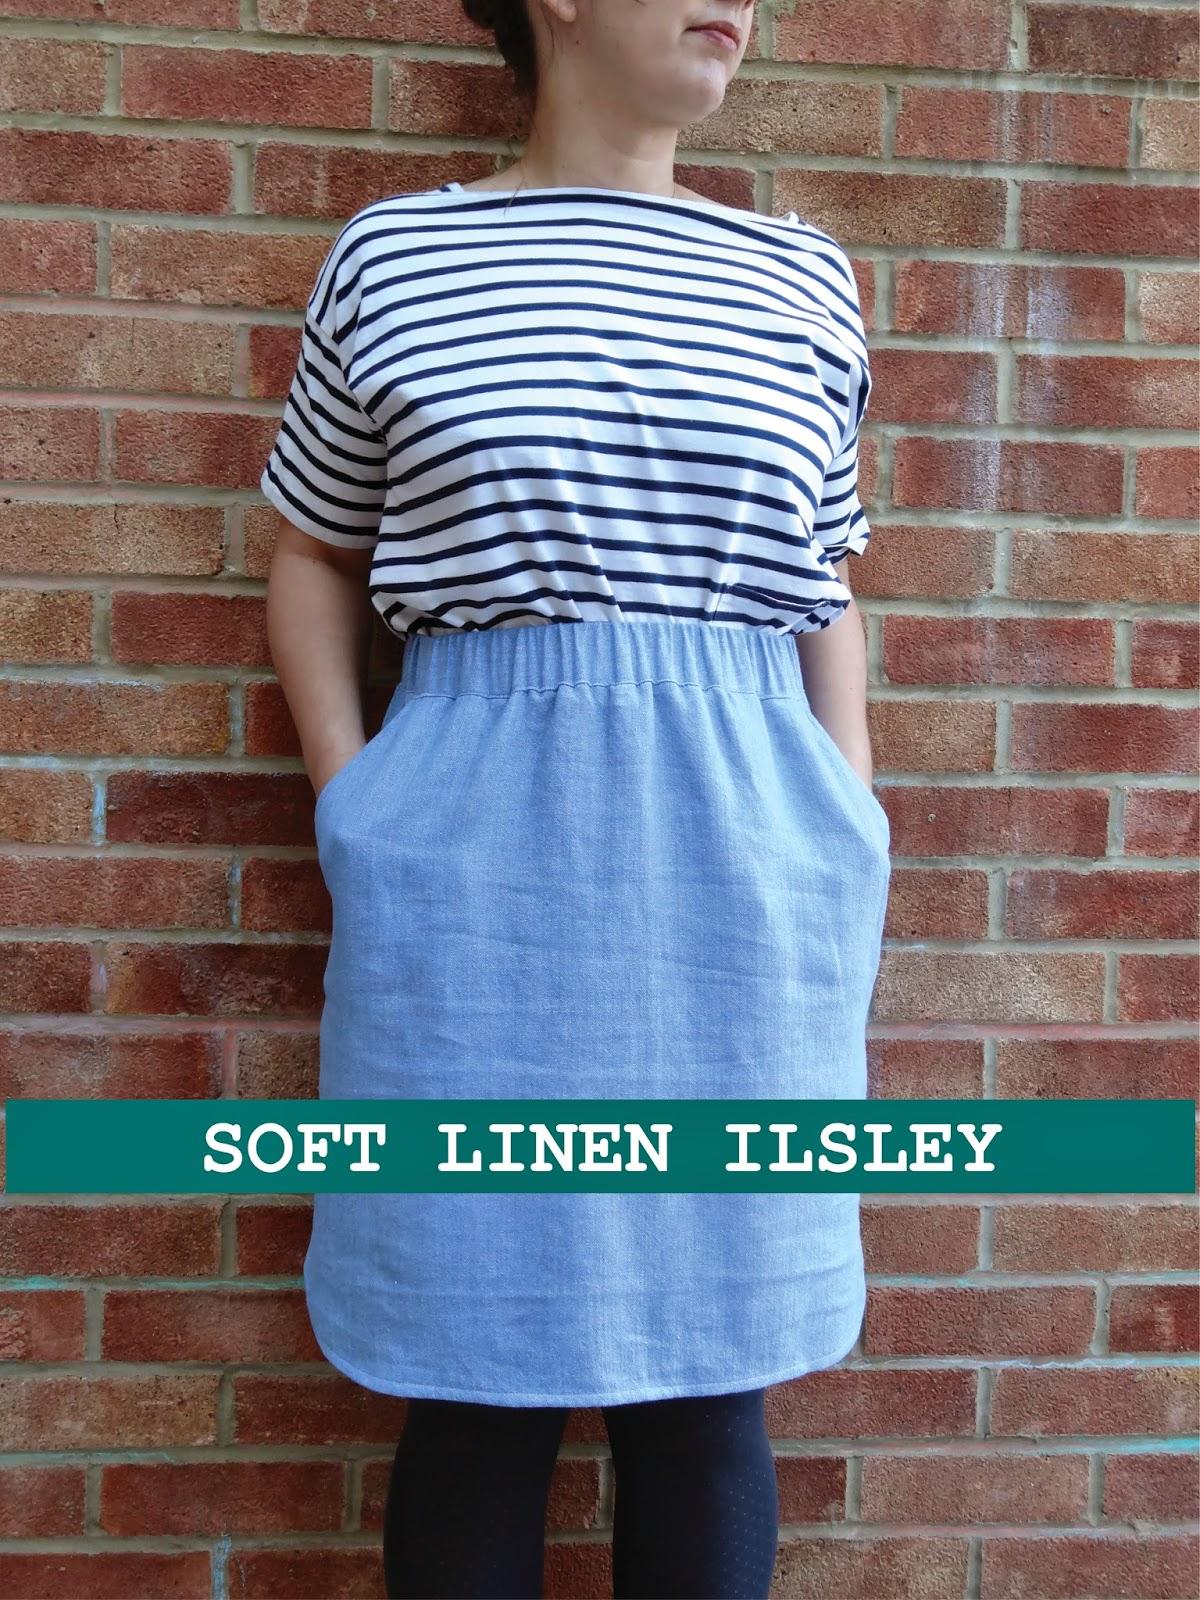 http://marillawalker.blogspot.co.uk/2015/02/ilsley-skirt-free-pattern-download.html